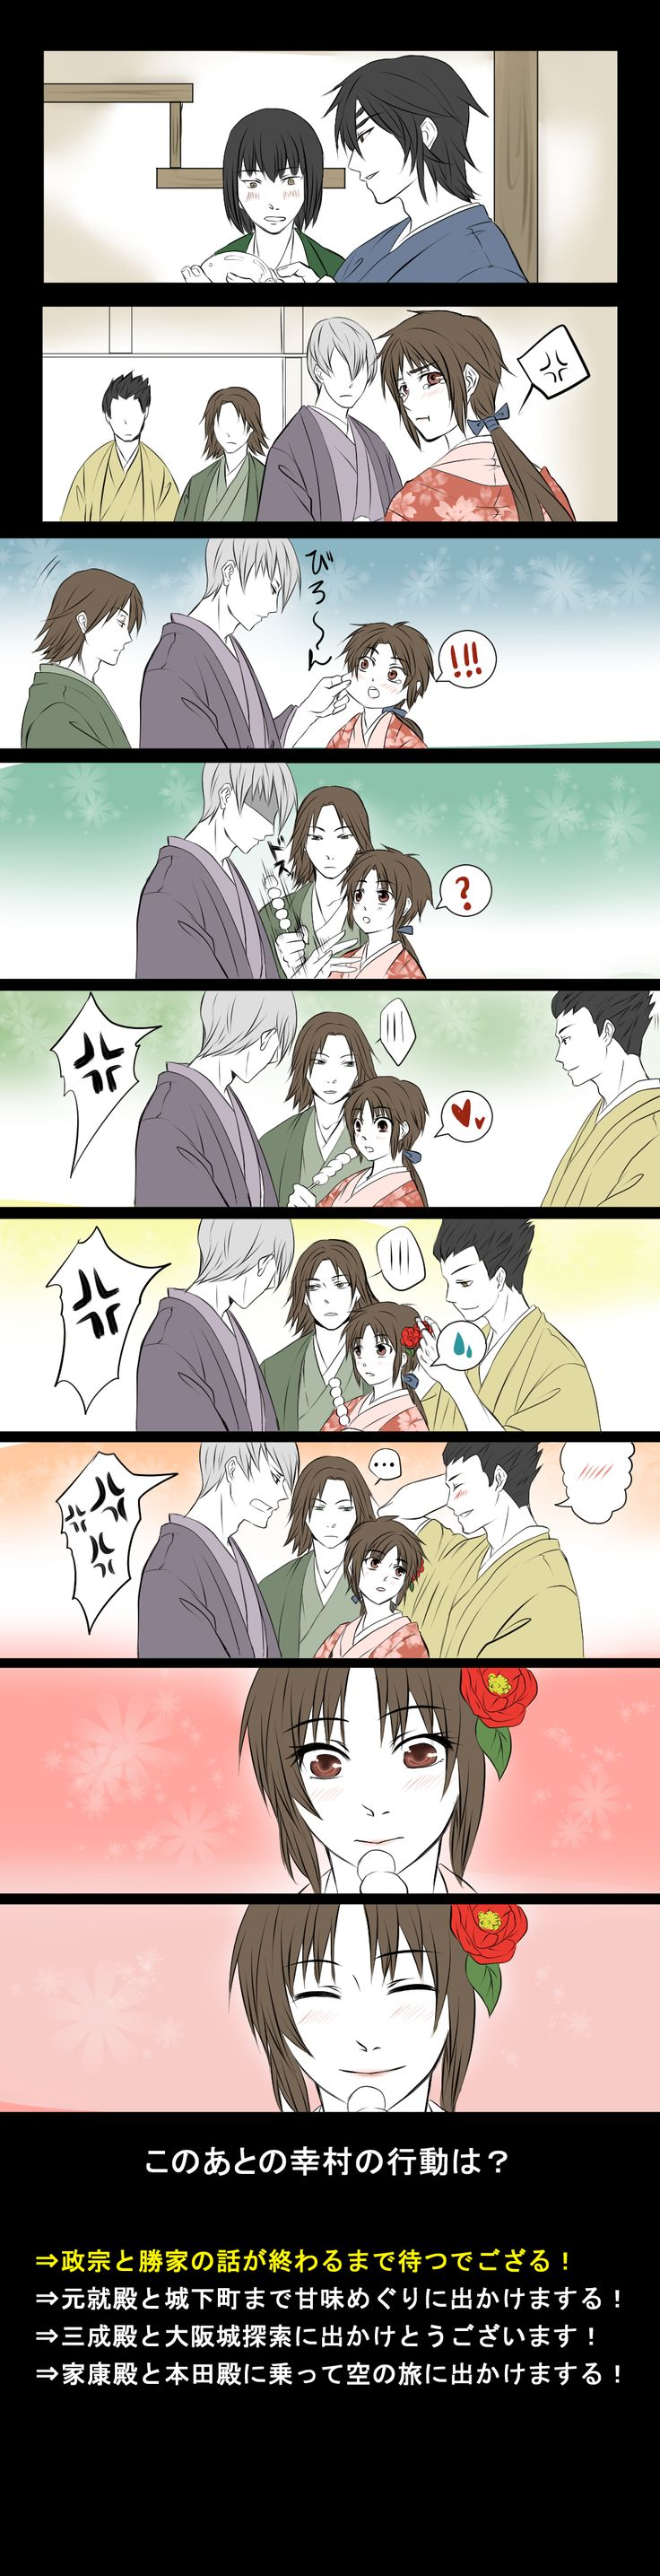 Sanada Yukimura (genderbent), Date Masamune, Shibata Katsuie, Ishida Mitsunari, Mori Motonari, Tokugawa Ieyasu, Sengoku Basara, Art by: よもやま (Pixiv ID: 2215053).